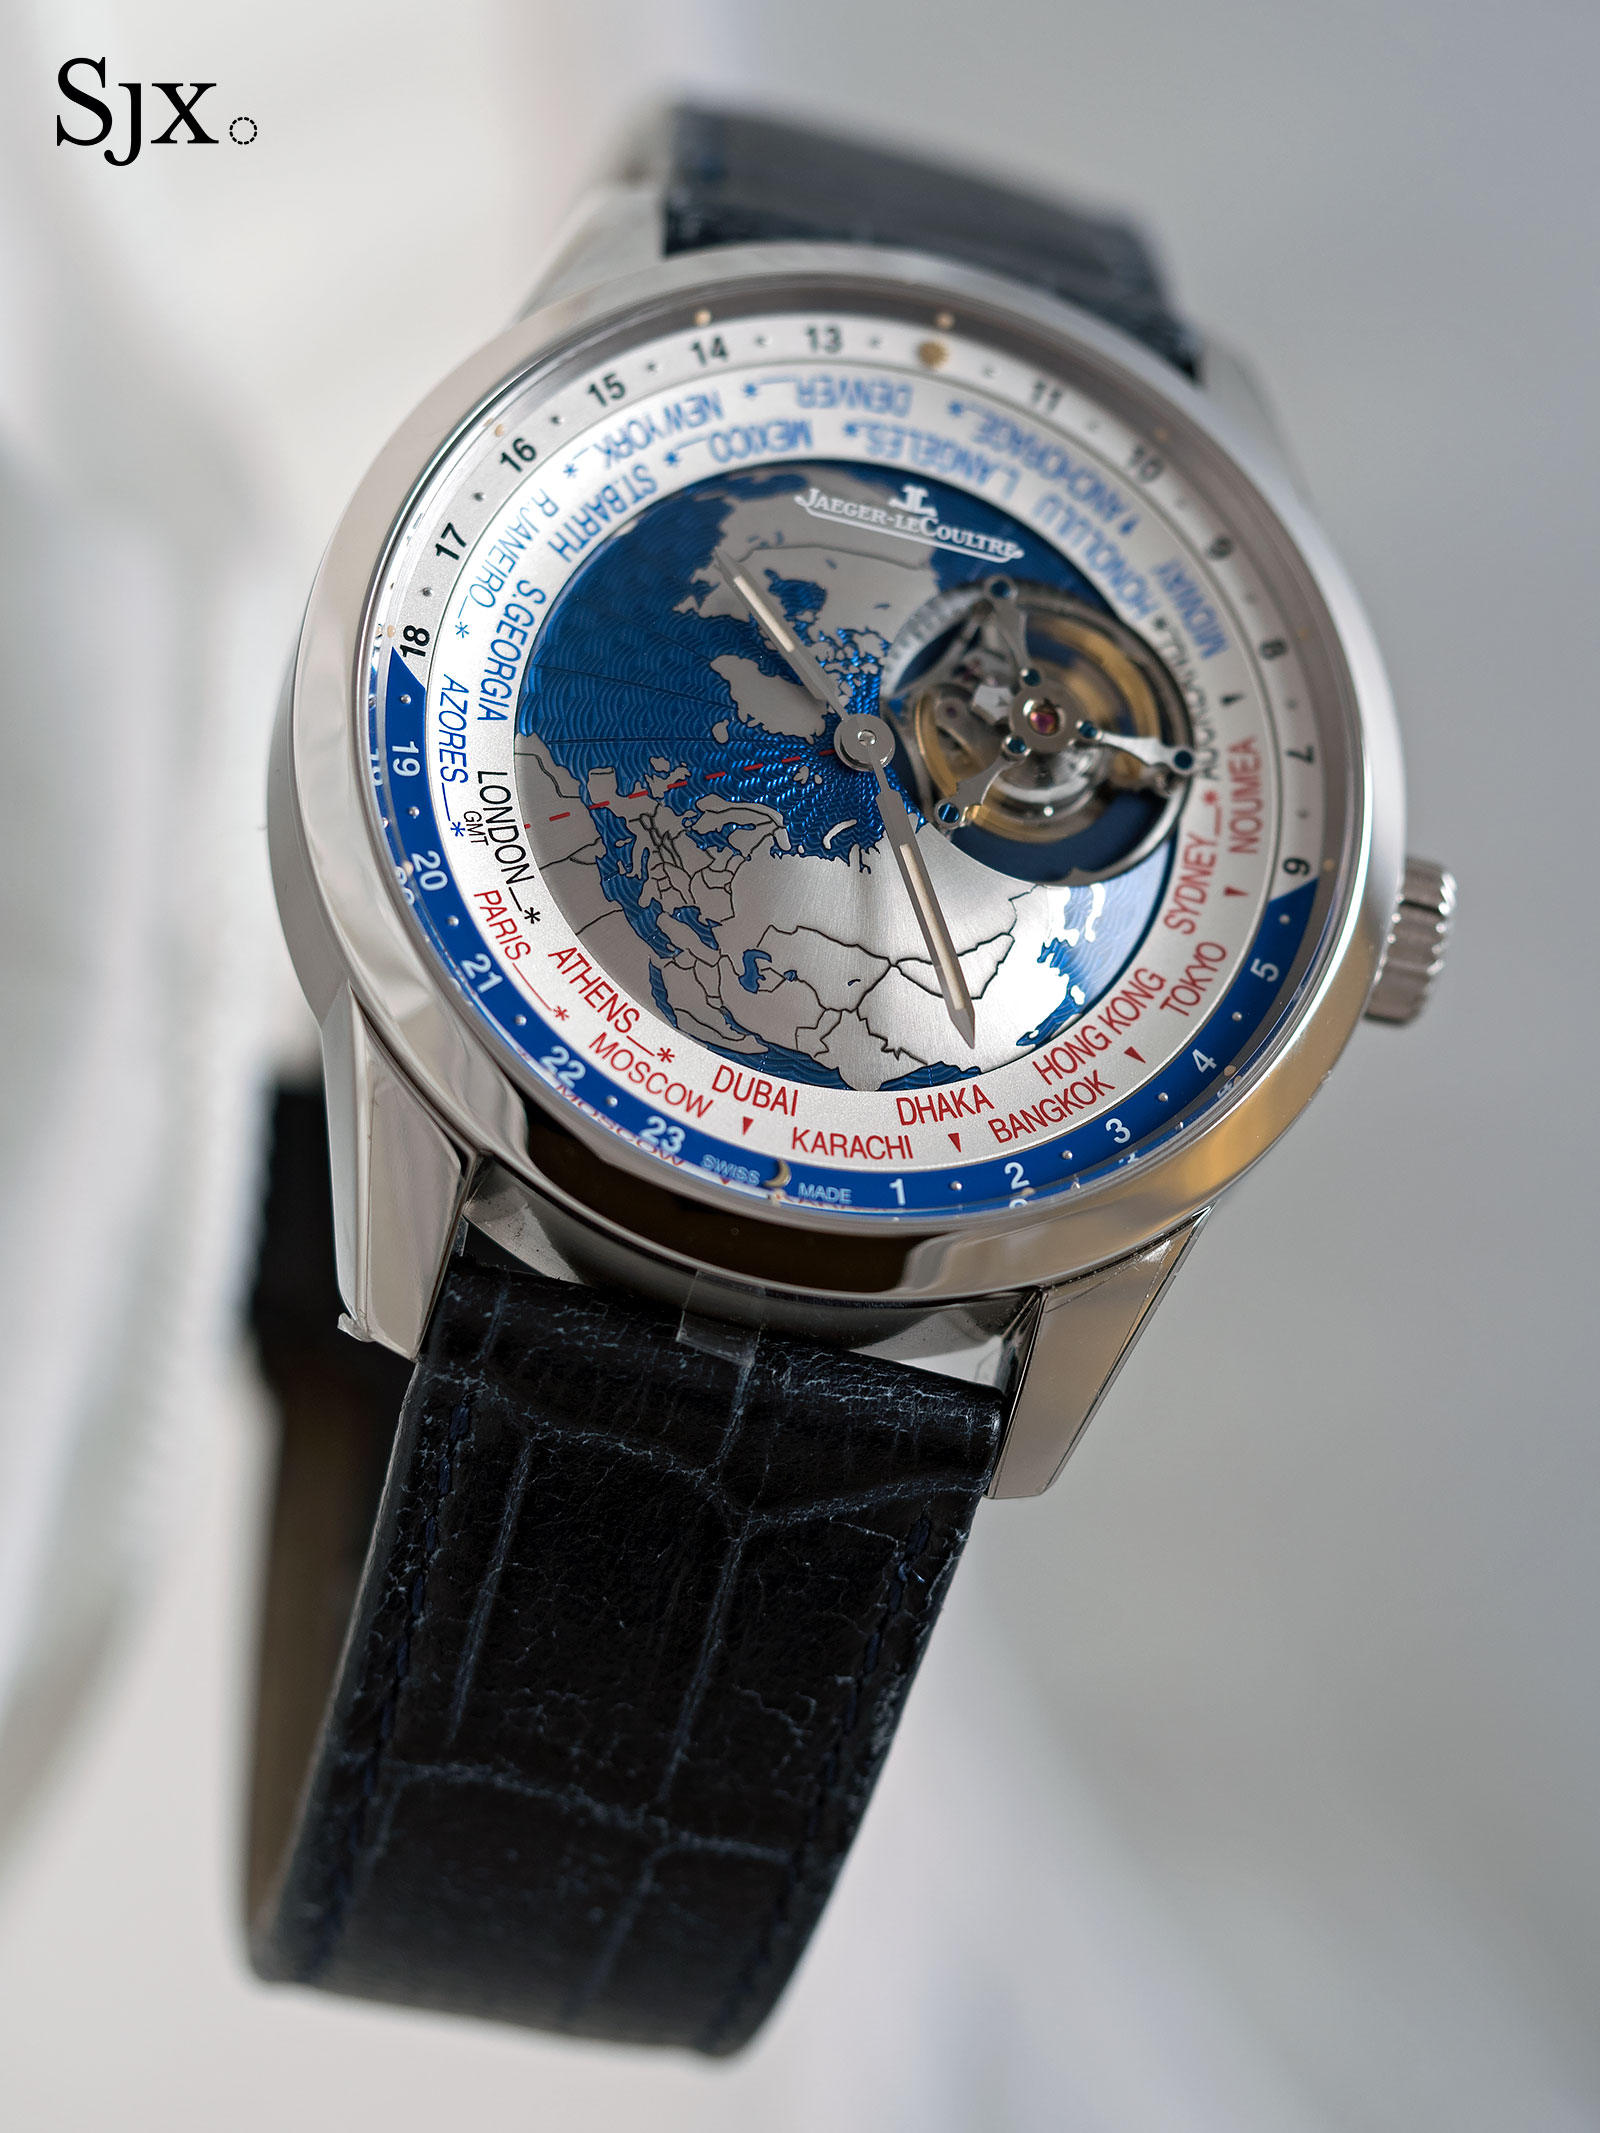 Jaeger-LeCoultre Geophysic Tourbillon Universal Time 3